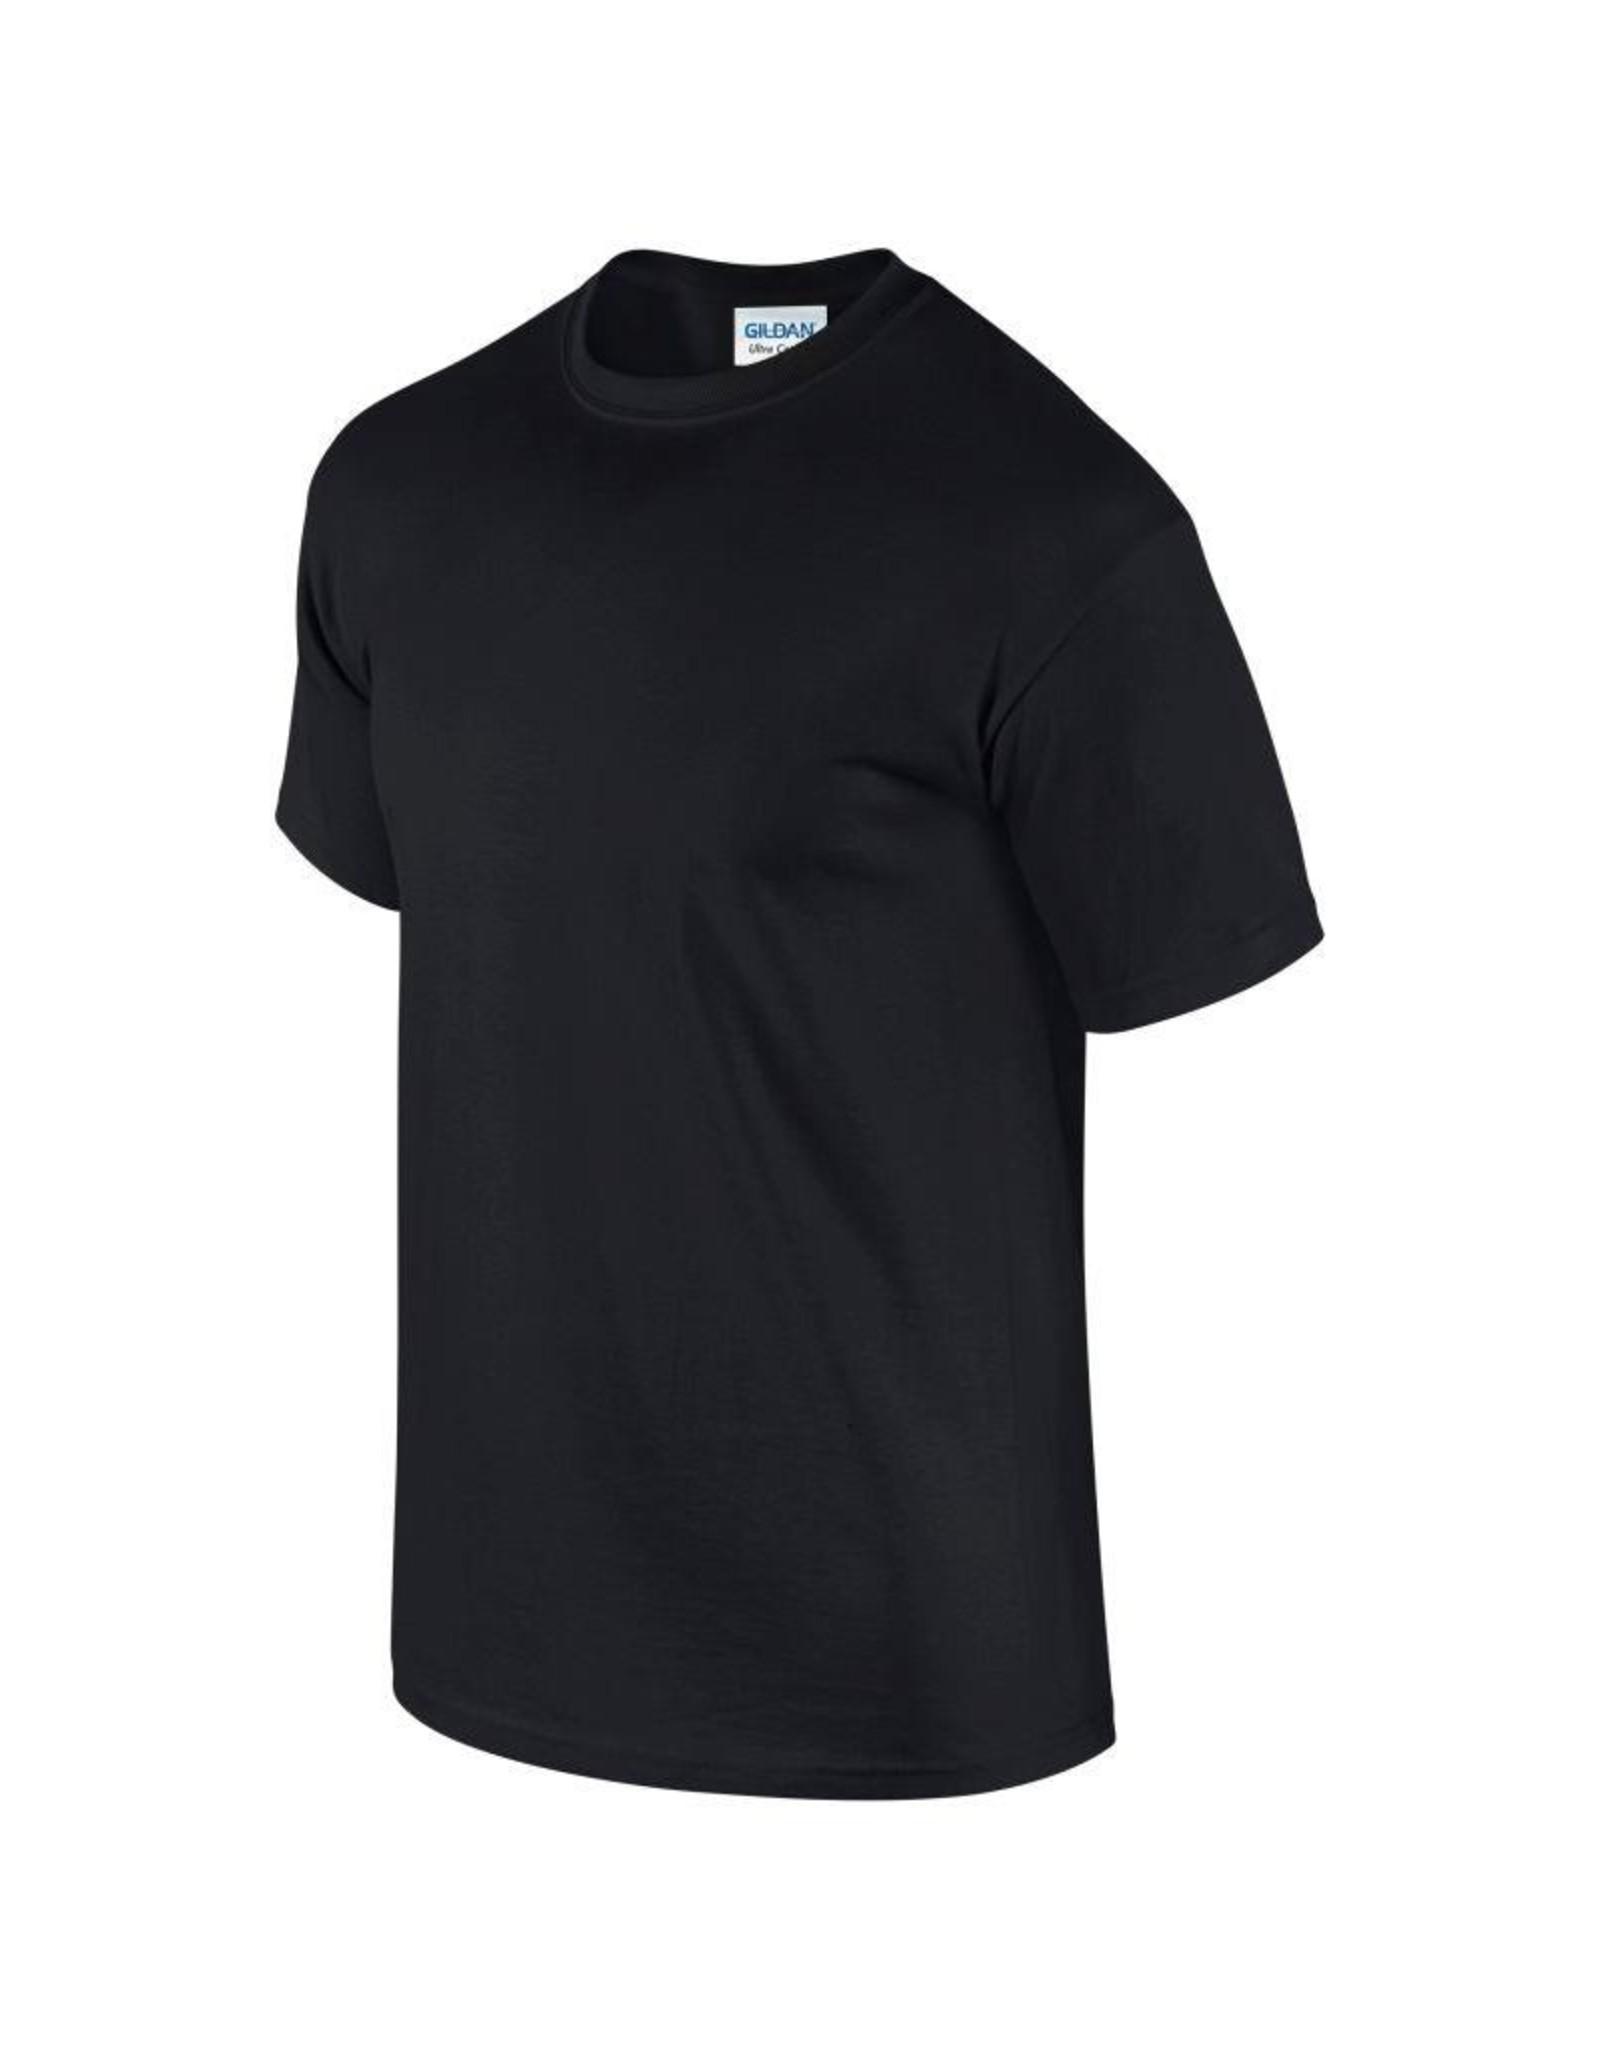 Gildan T-SHIRT heavy basic zwart